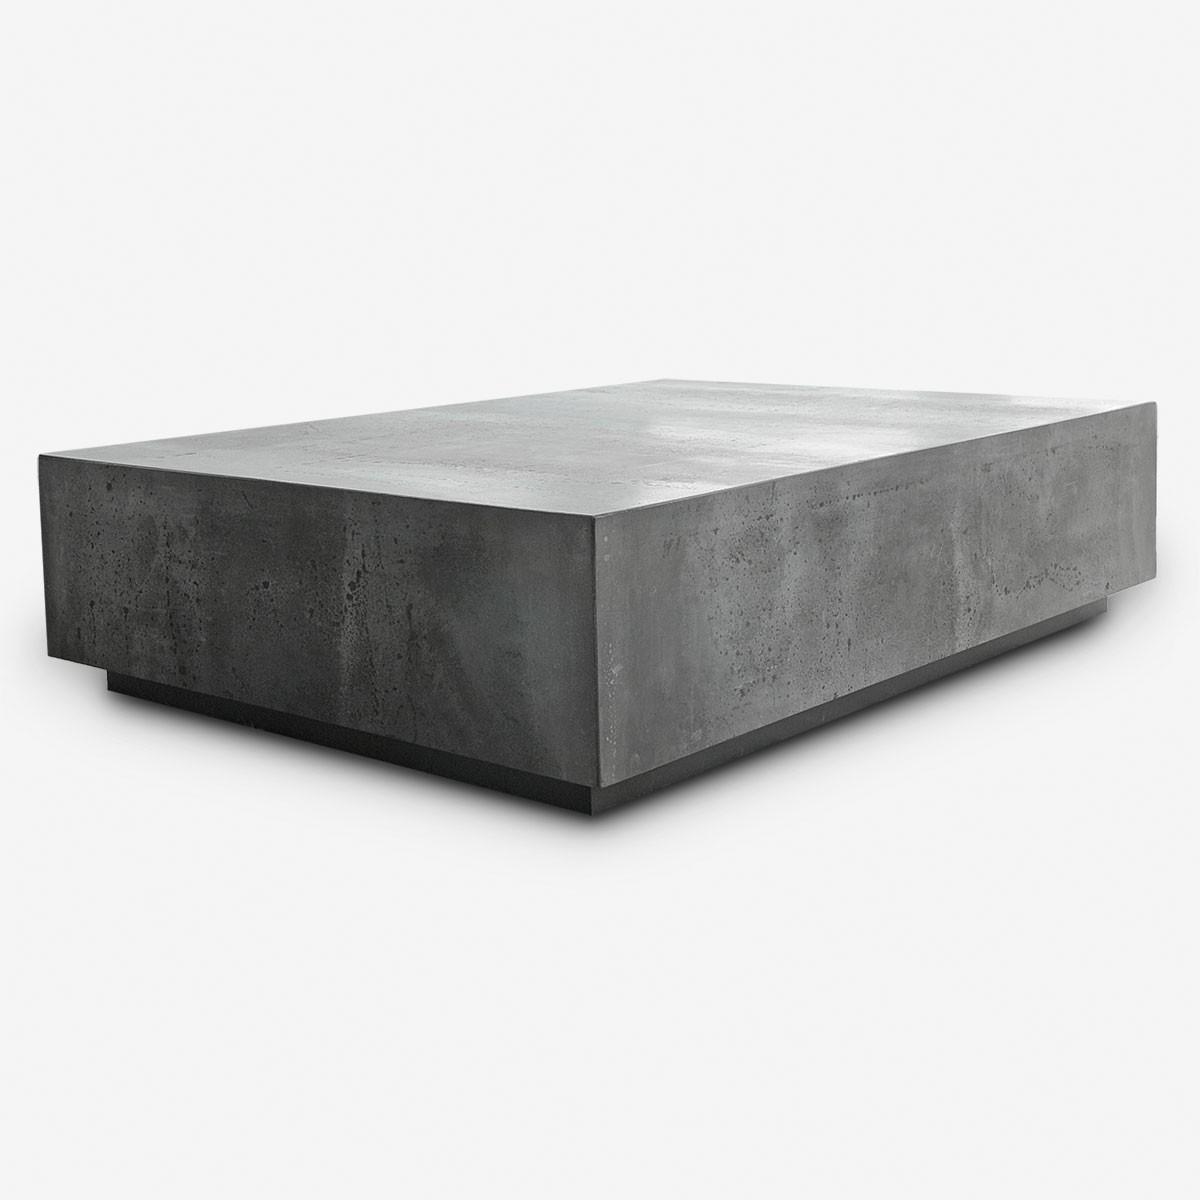 Concrete Coffee Table Th2studio regarding dimensions 1200 X 1200